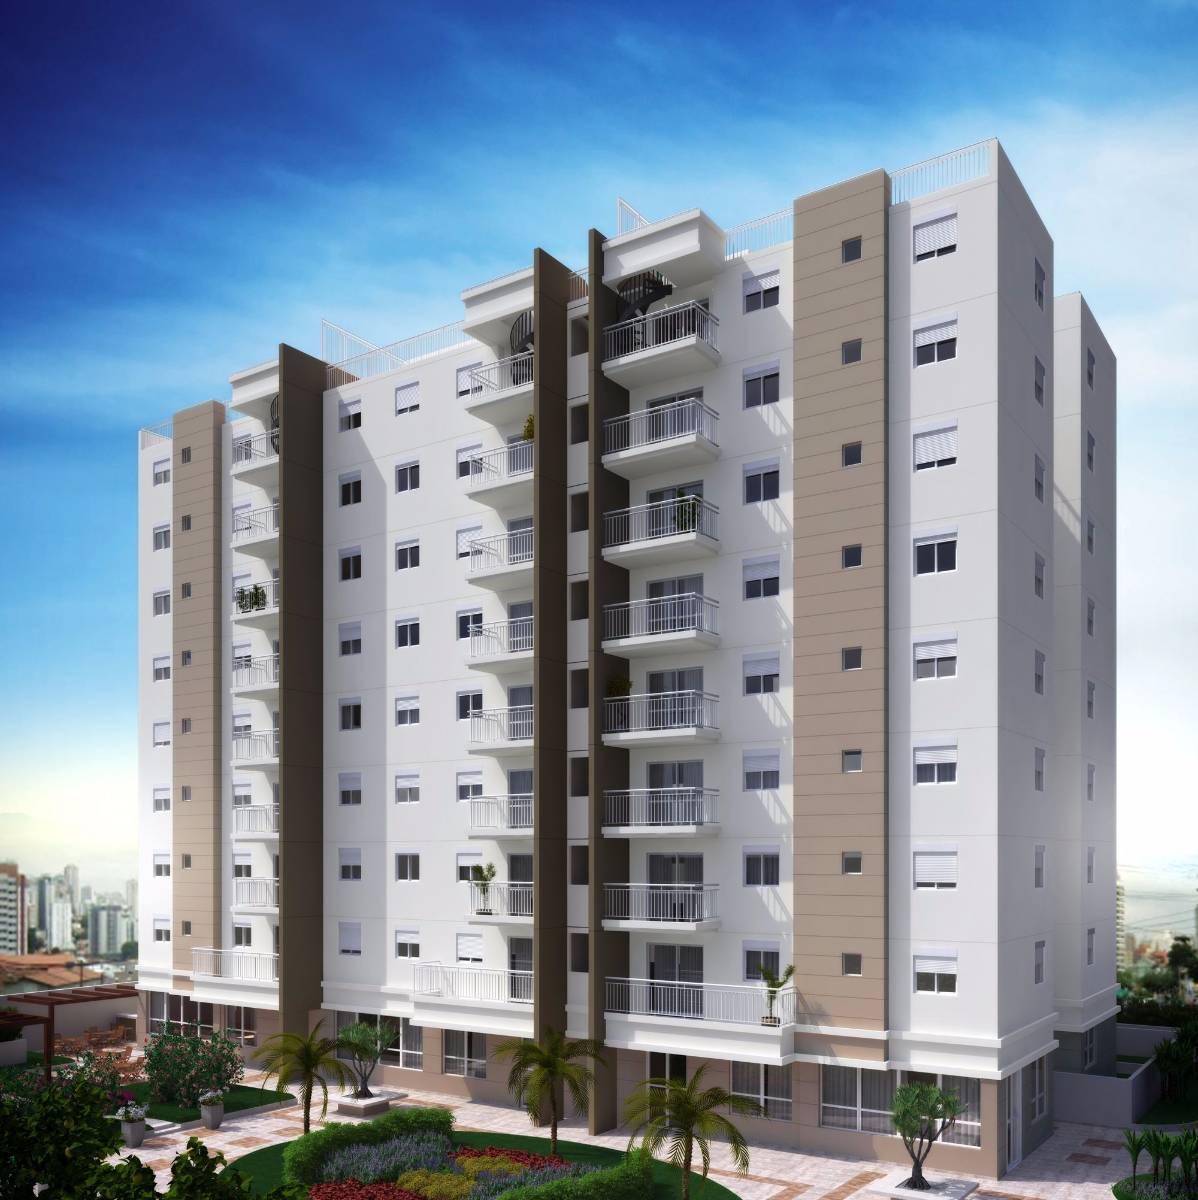 Vl. Gumercindo -  85 m, 3 dorm, (1 suite), 2 vg, depósito (PURESA 11 94011-0687)